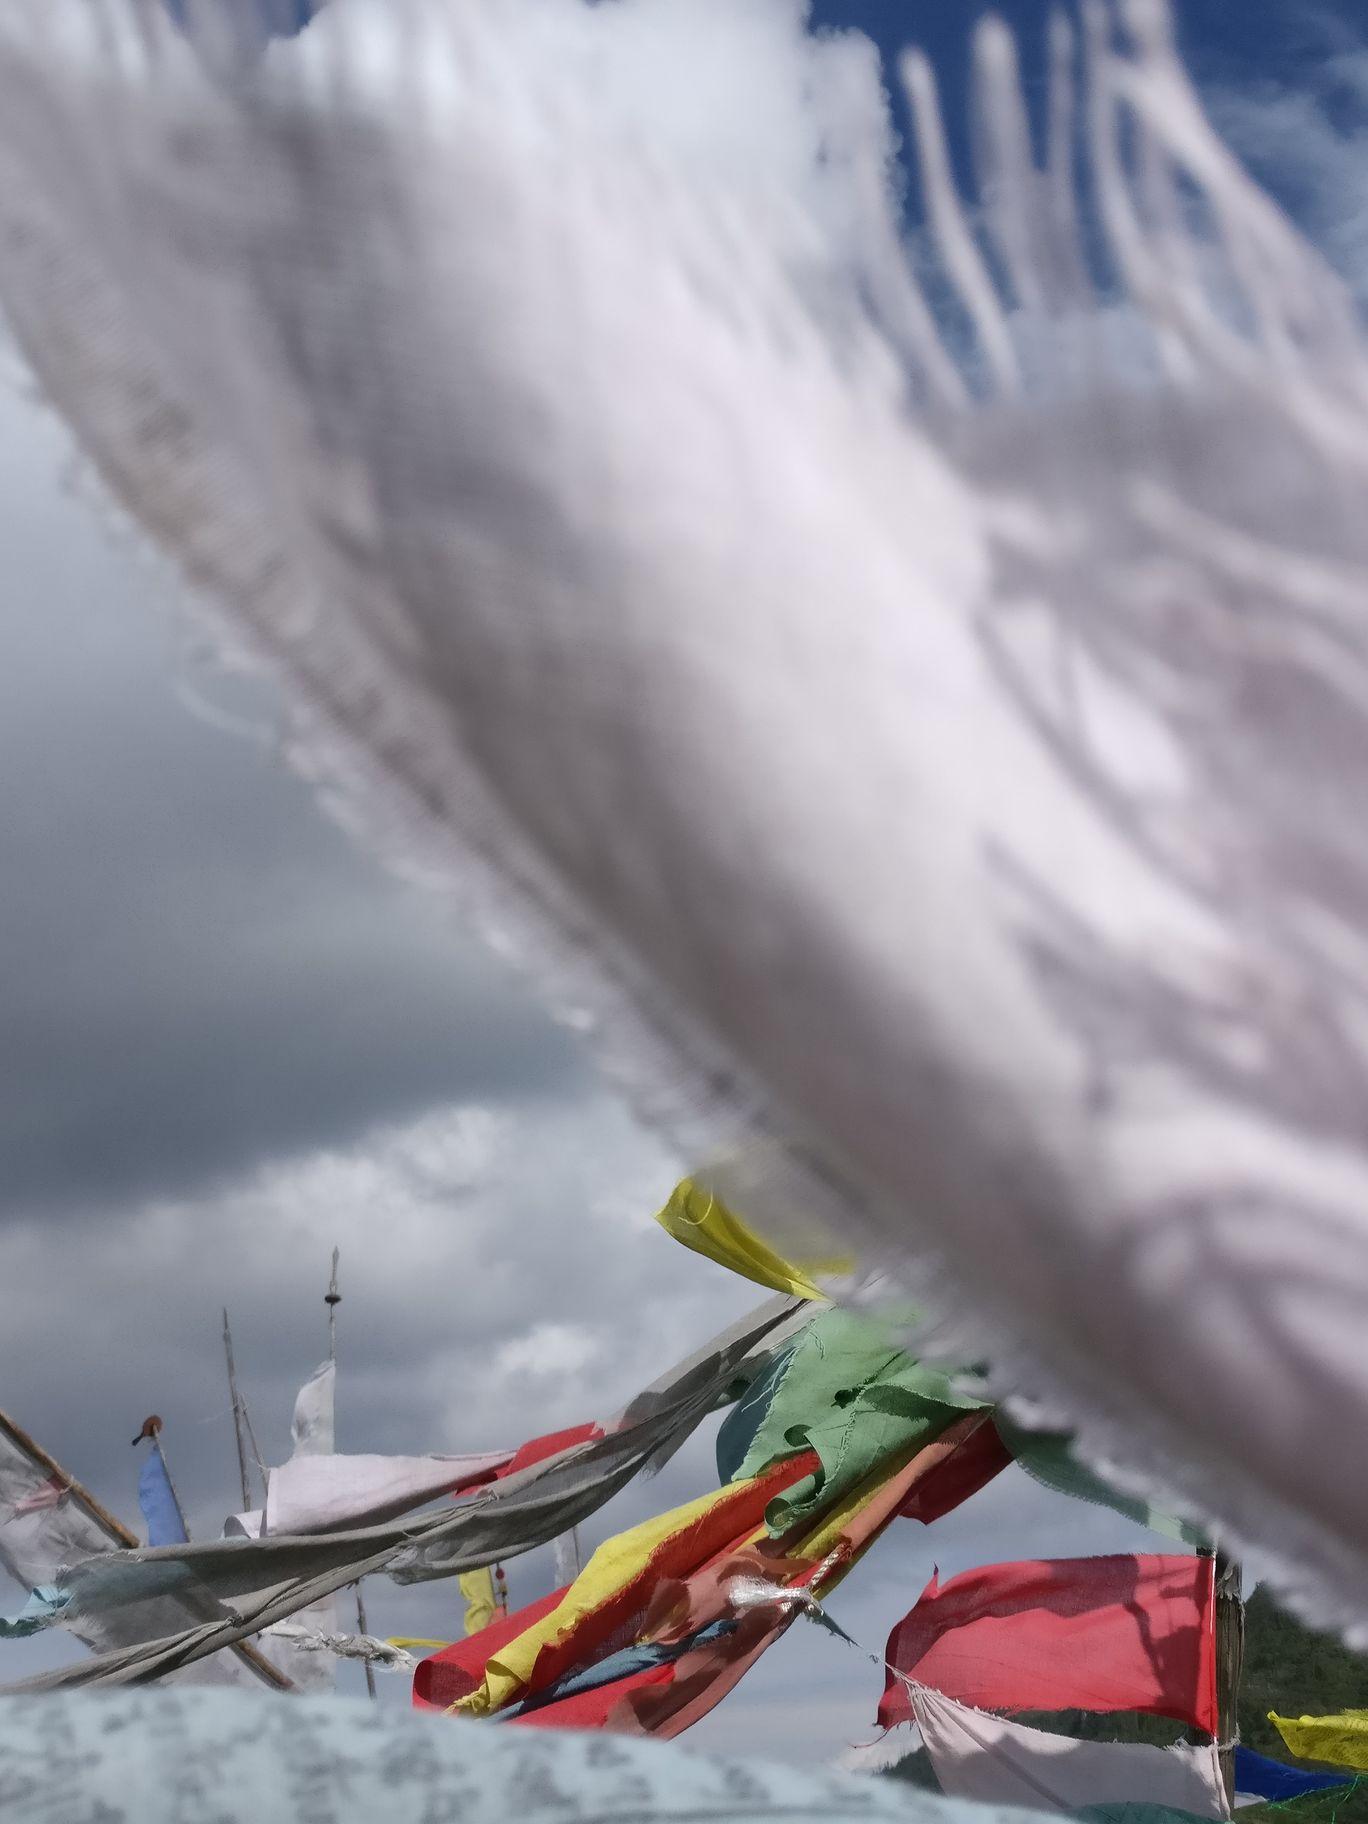 Photo of Bhutan By Swathe Y